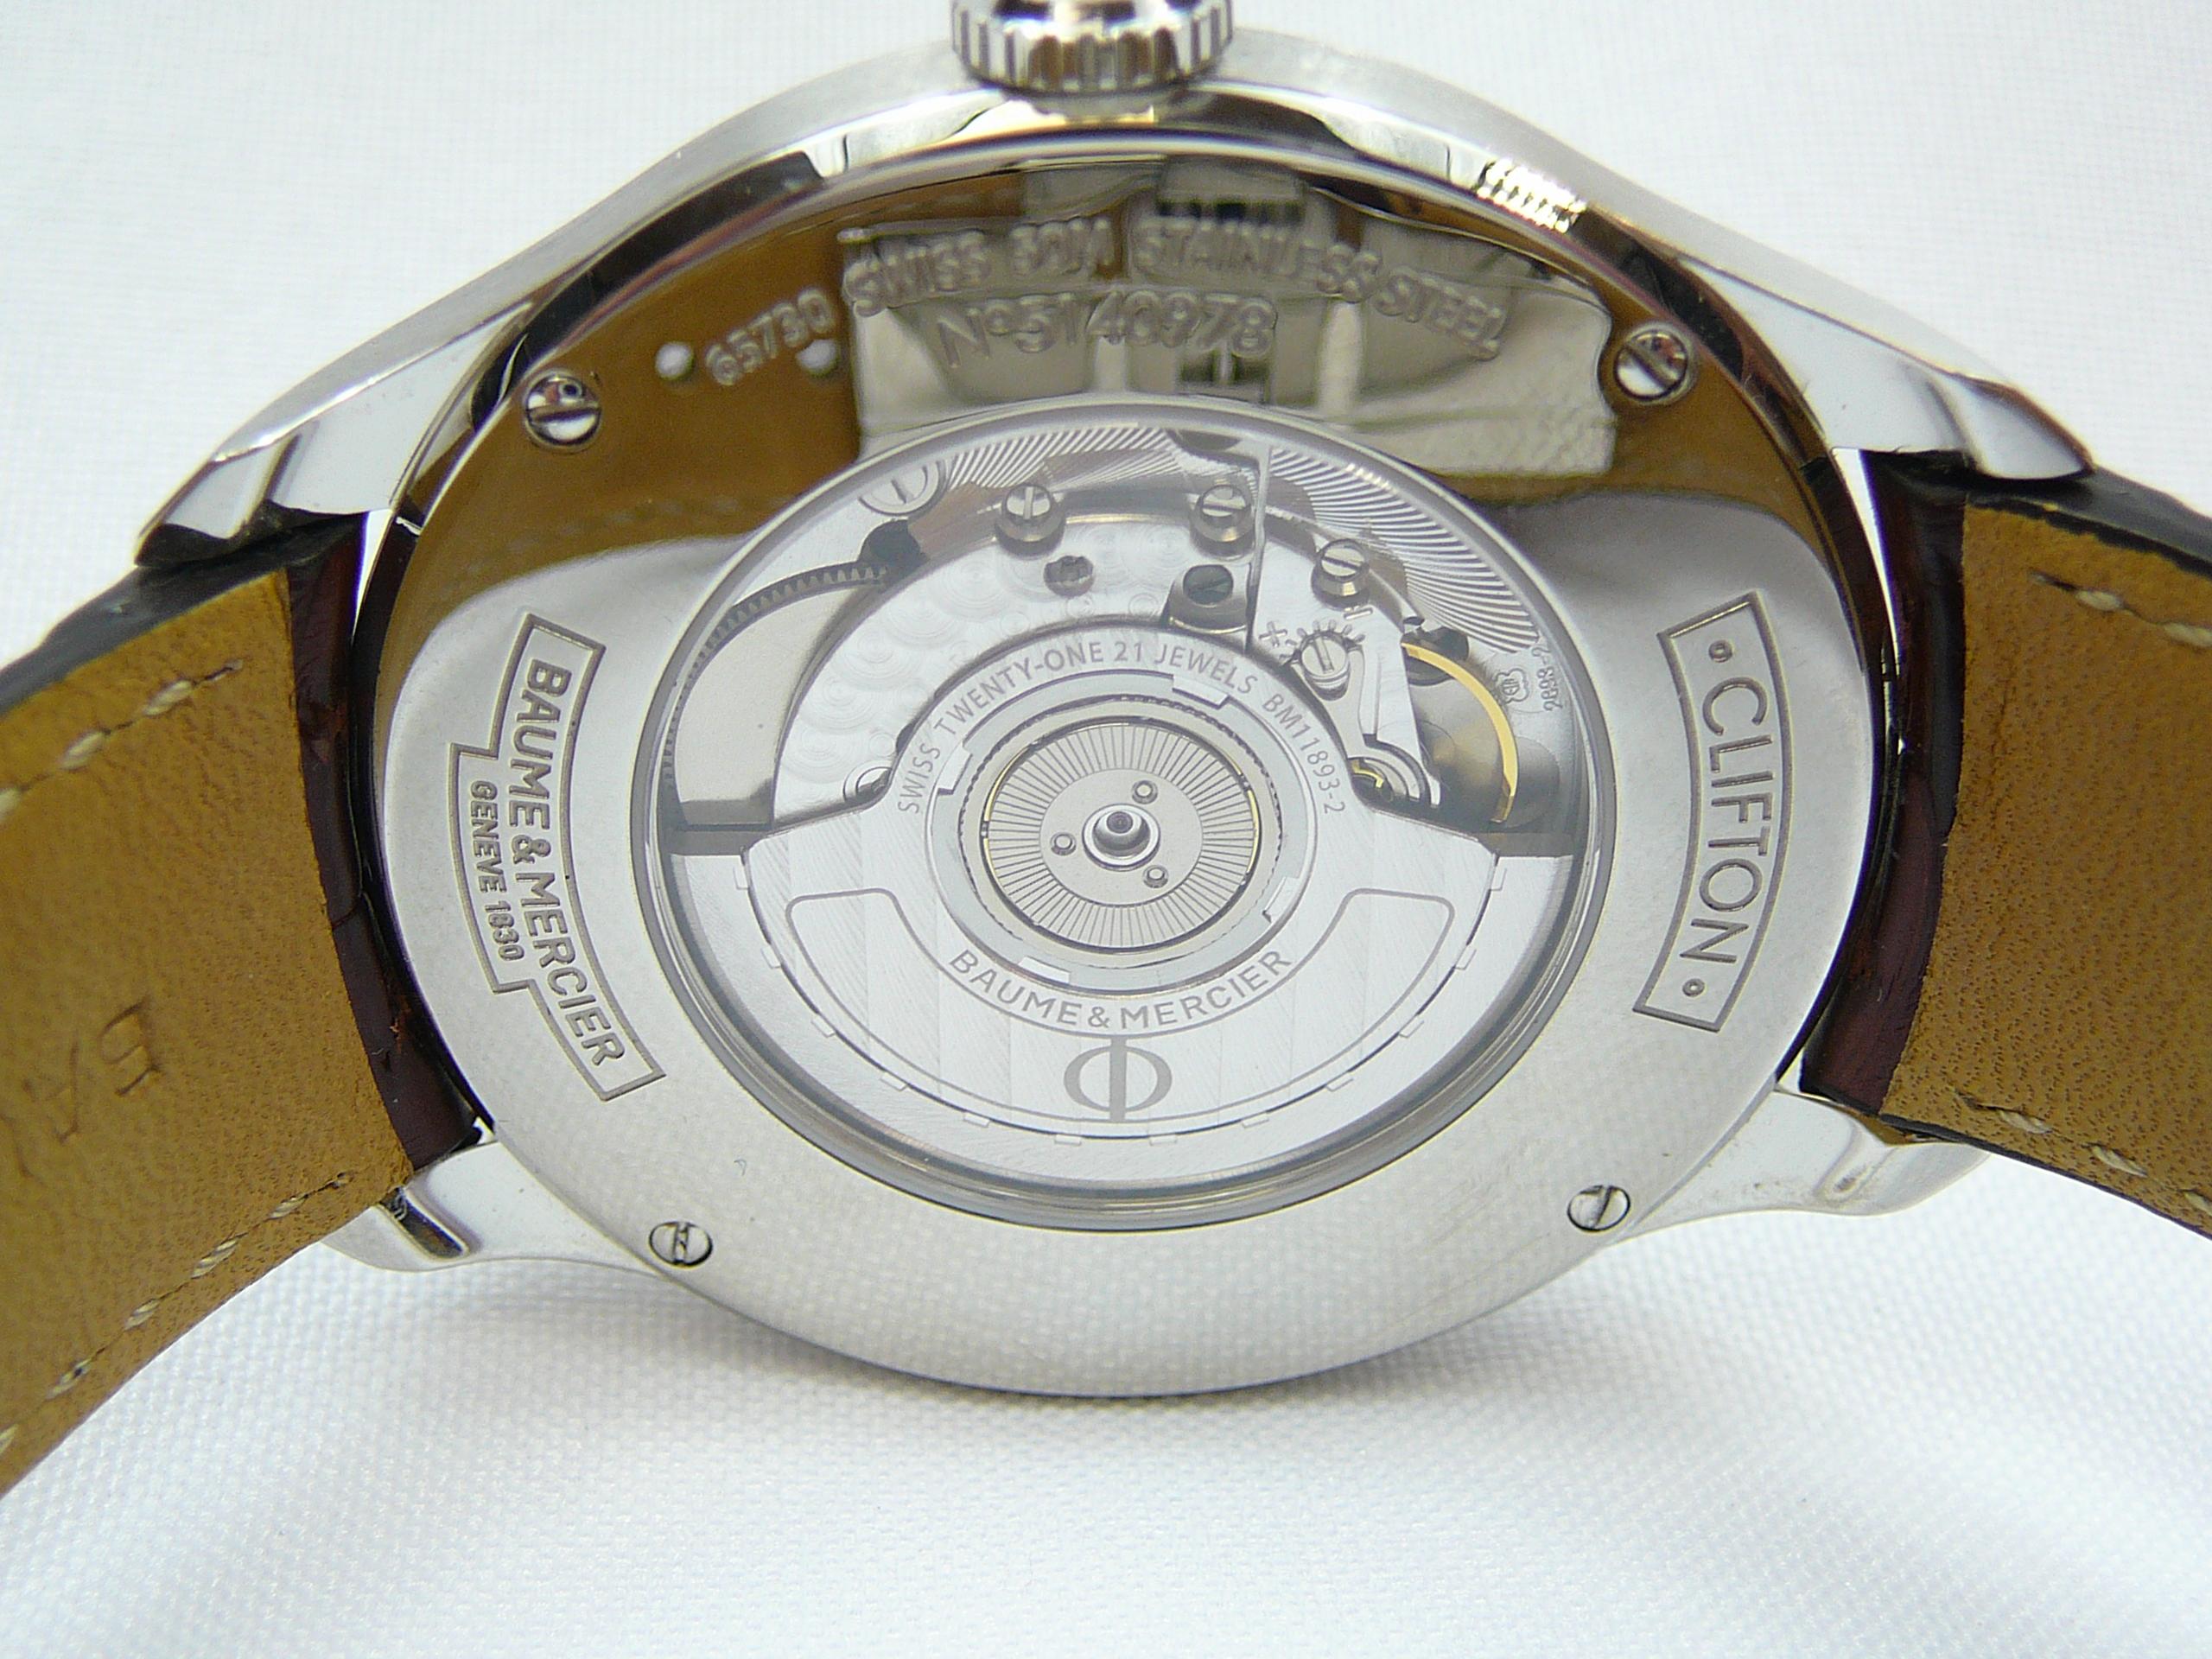 Gents Baume & Mercier Wrist Watch - Image 4 of 4